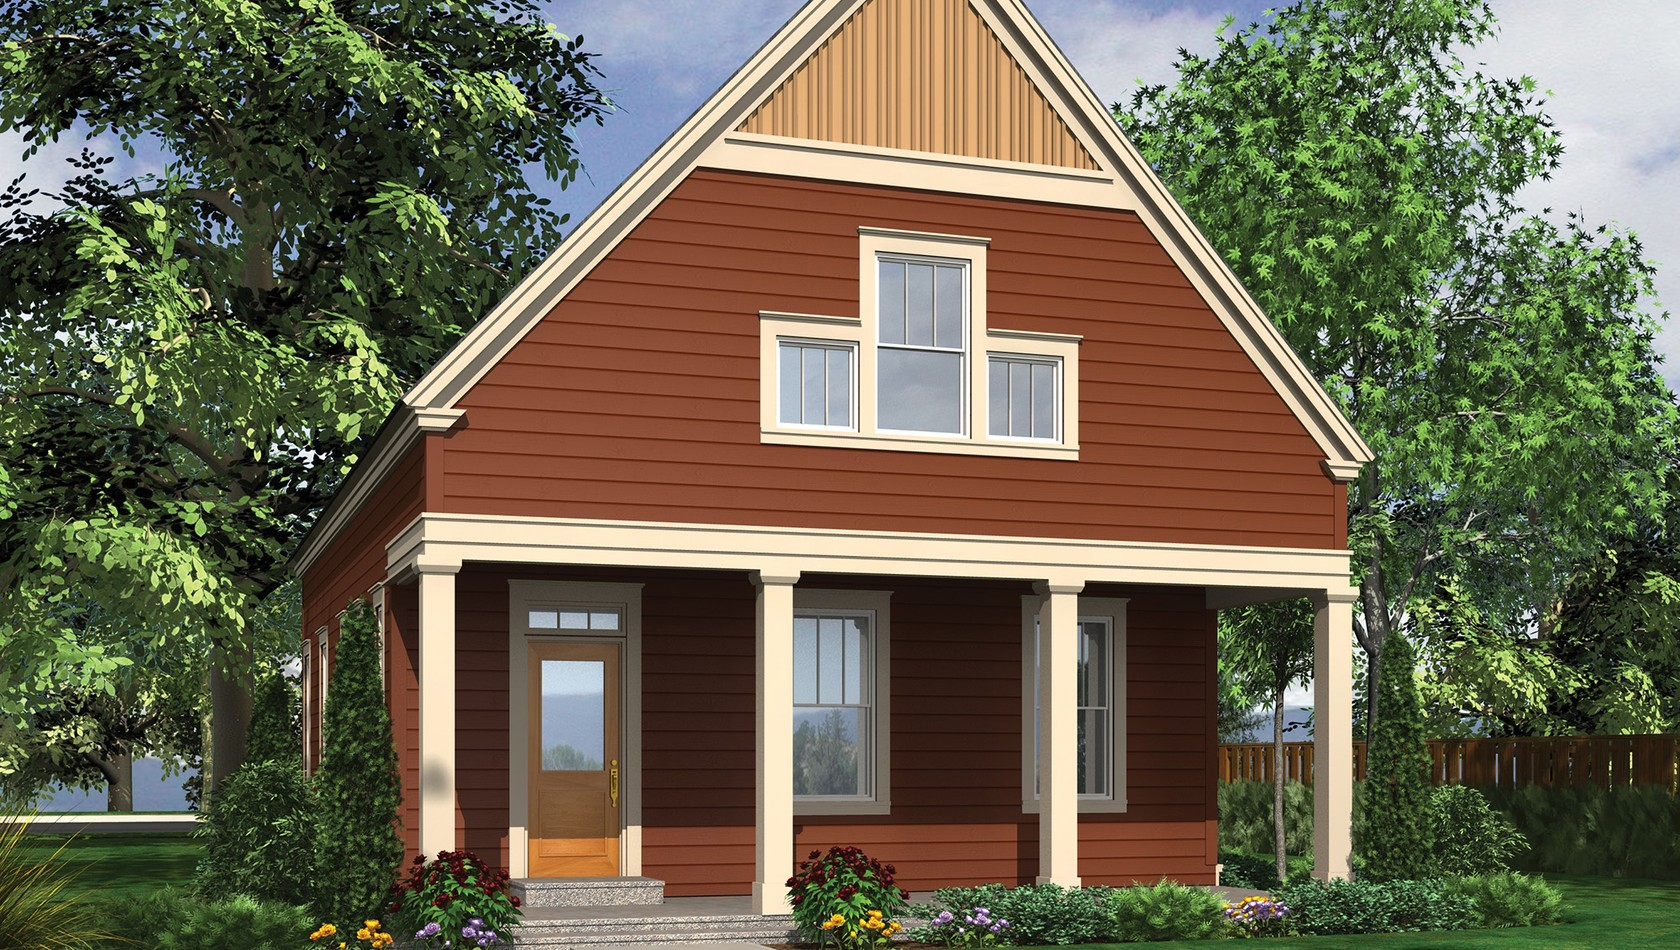 Mascord House Plan 21114: The Jasmine